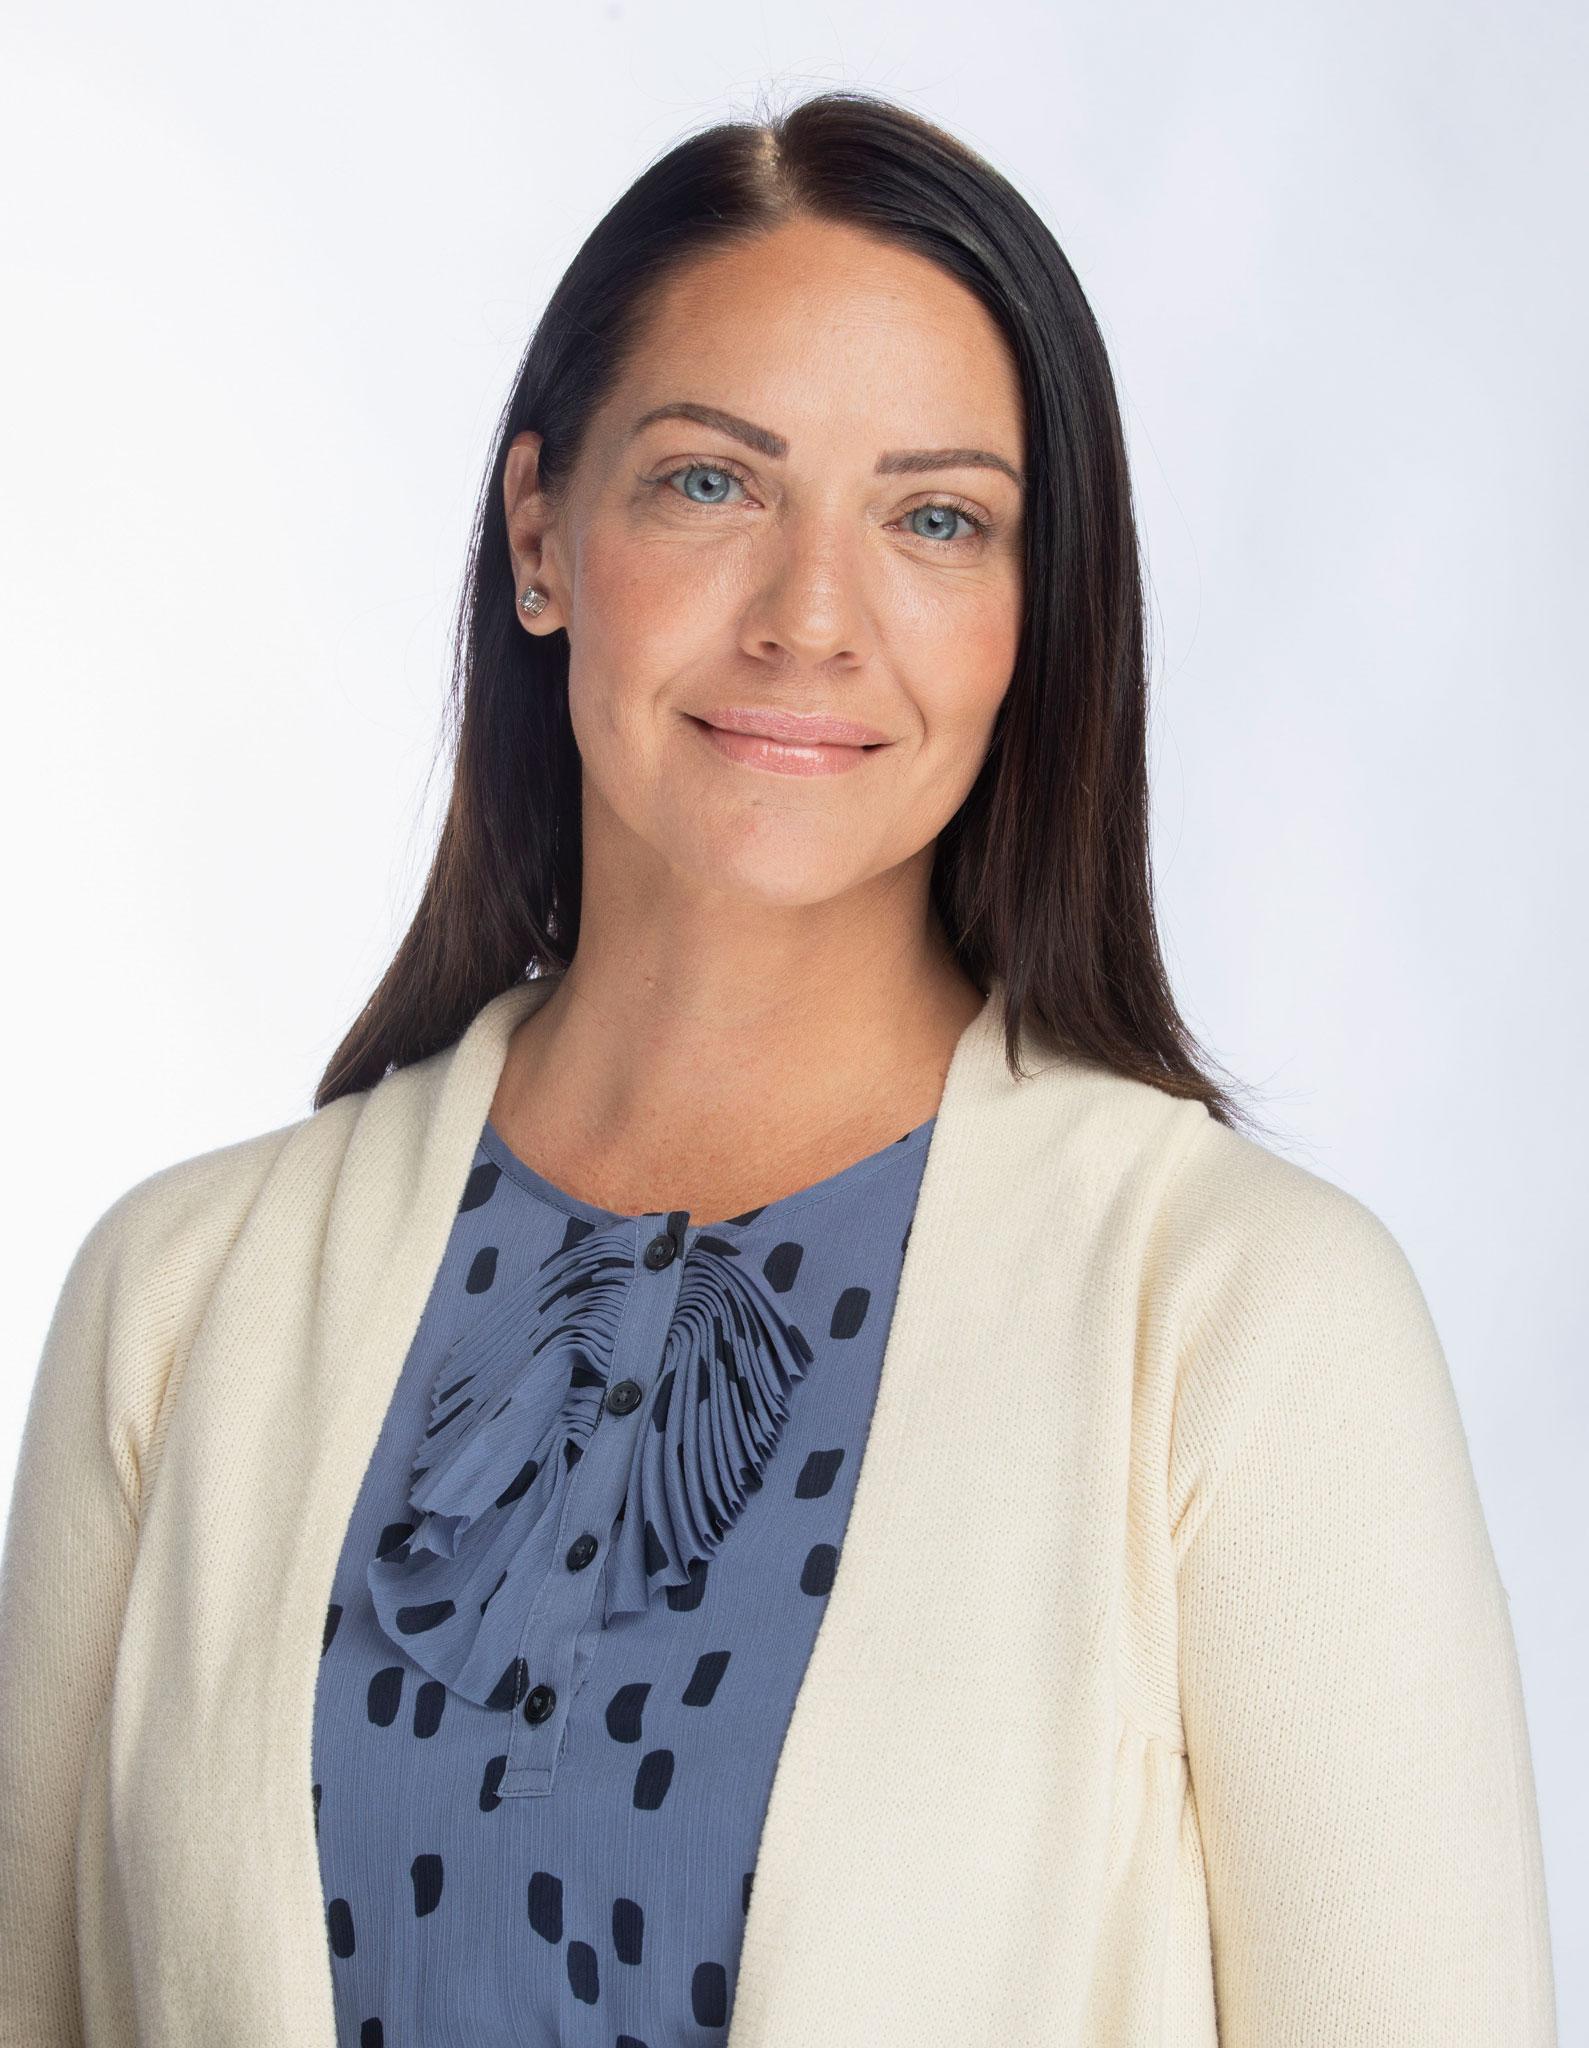 Amy Spagnolo